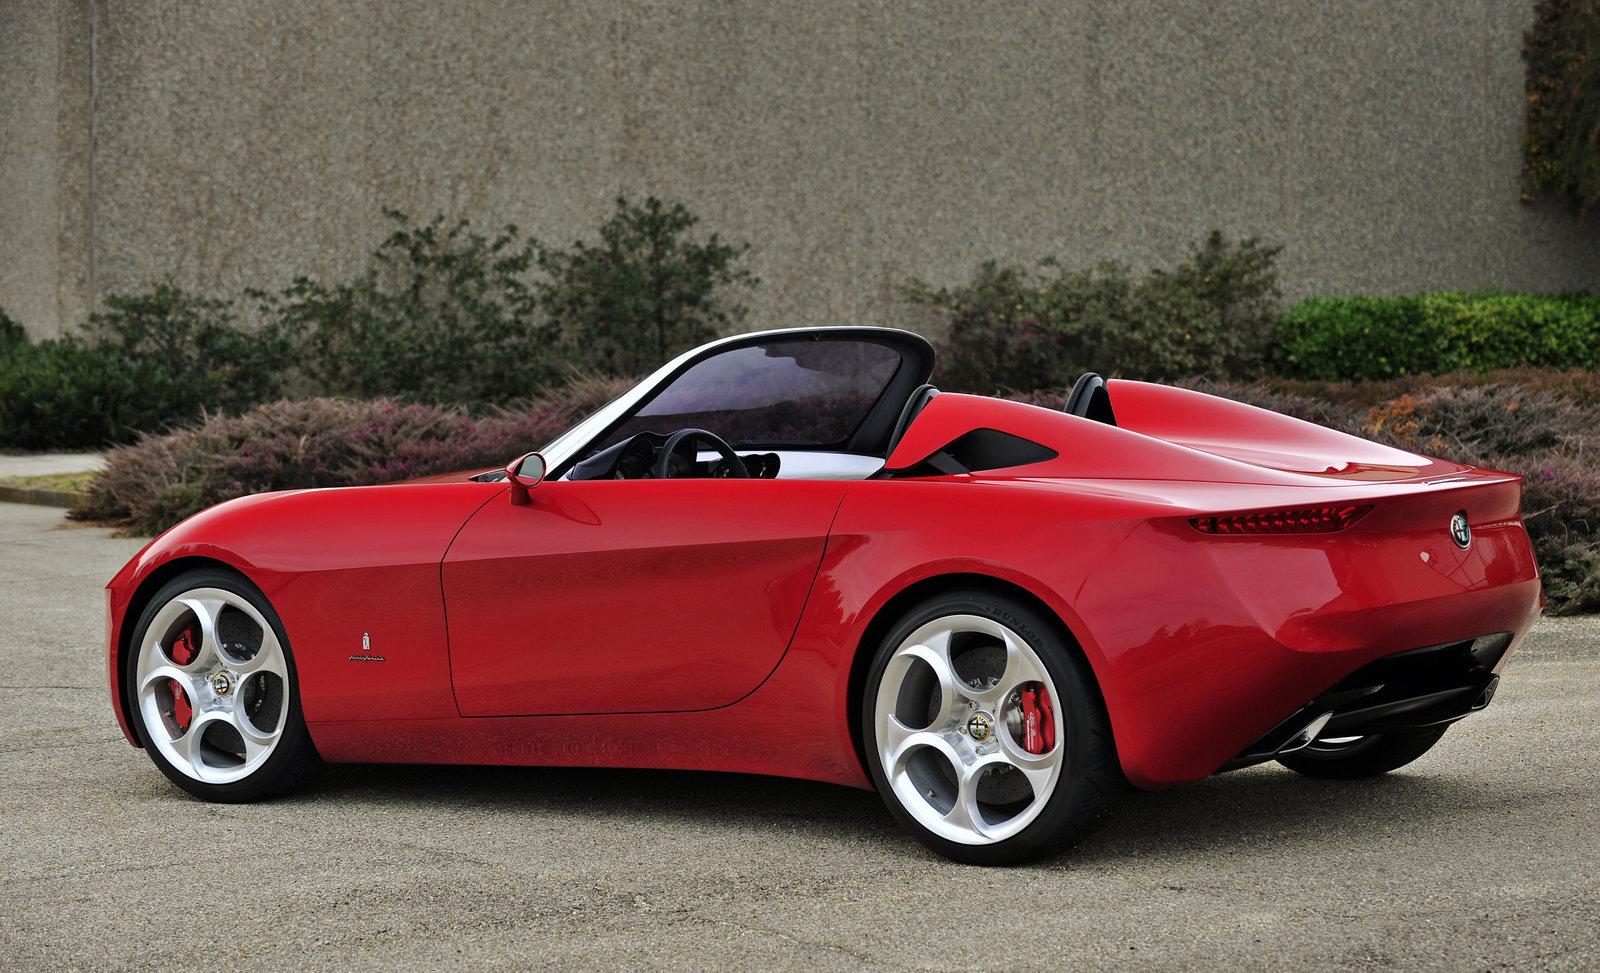 2012 alfa romeo spider fast speedy cars. Black Bedroom Furniture Sets. Home Design Ideas